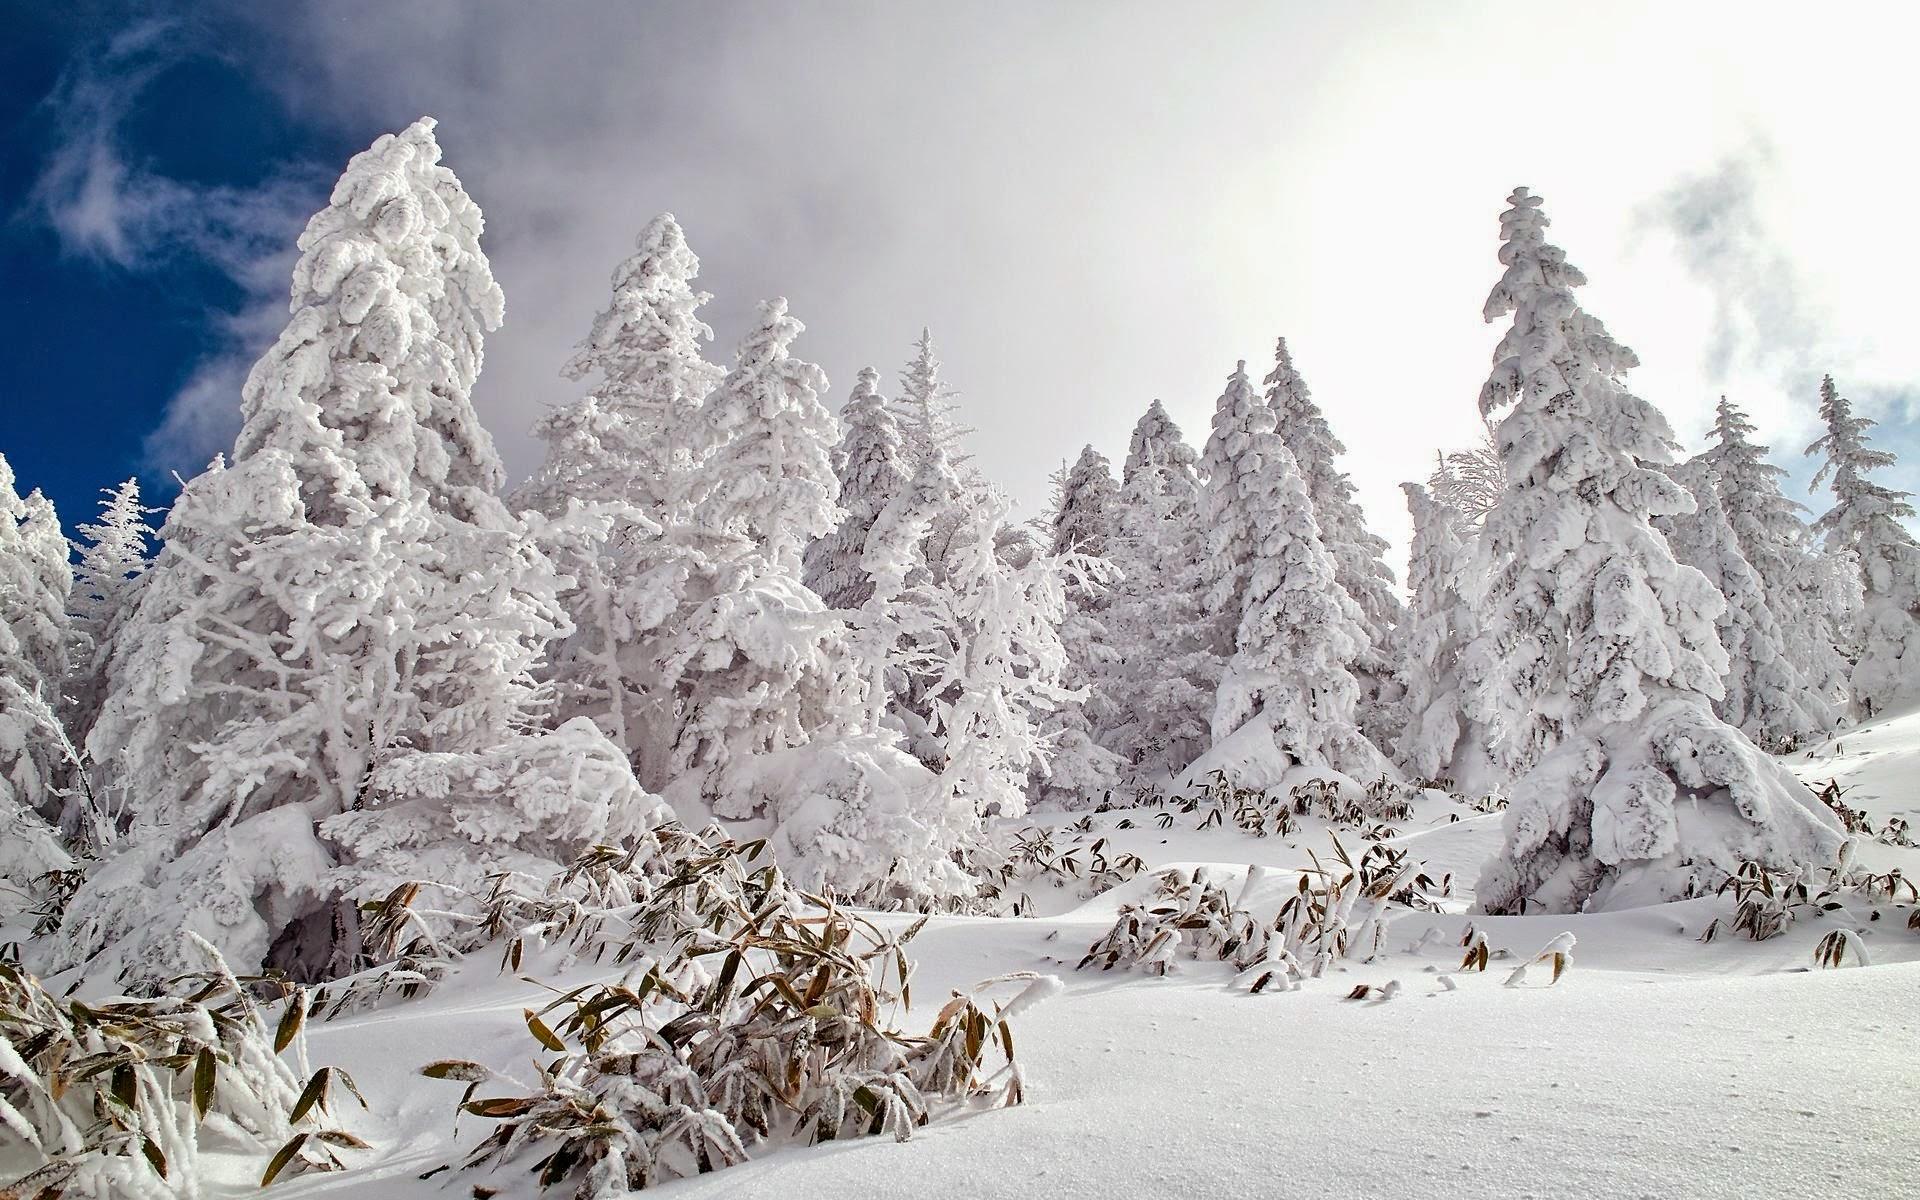 snowfall wallpaper desktop 1080p - photo #19